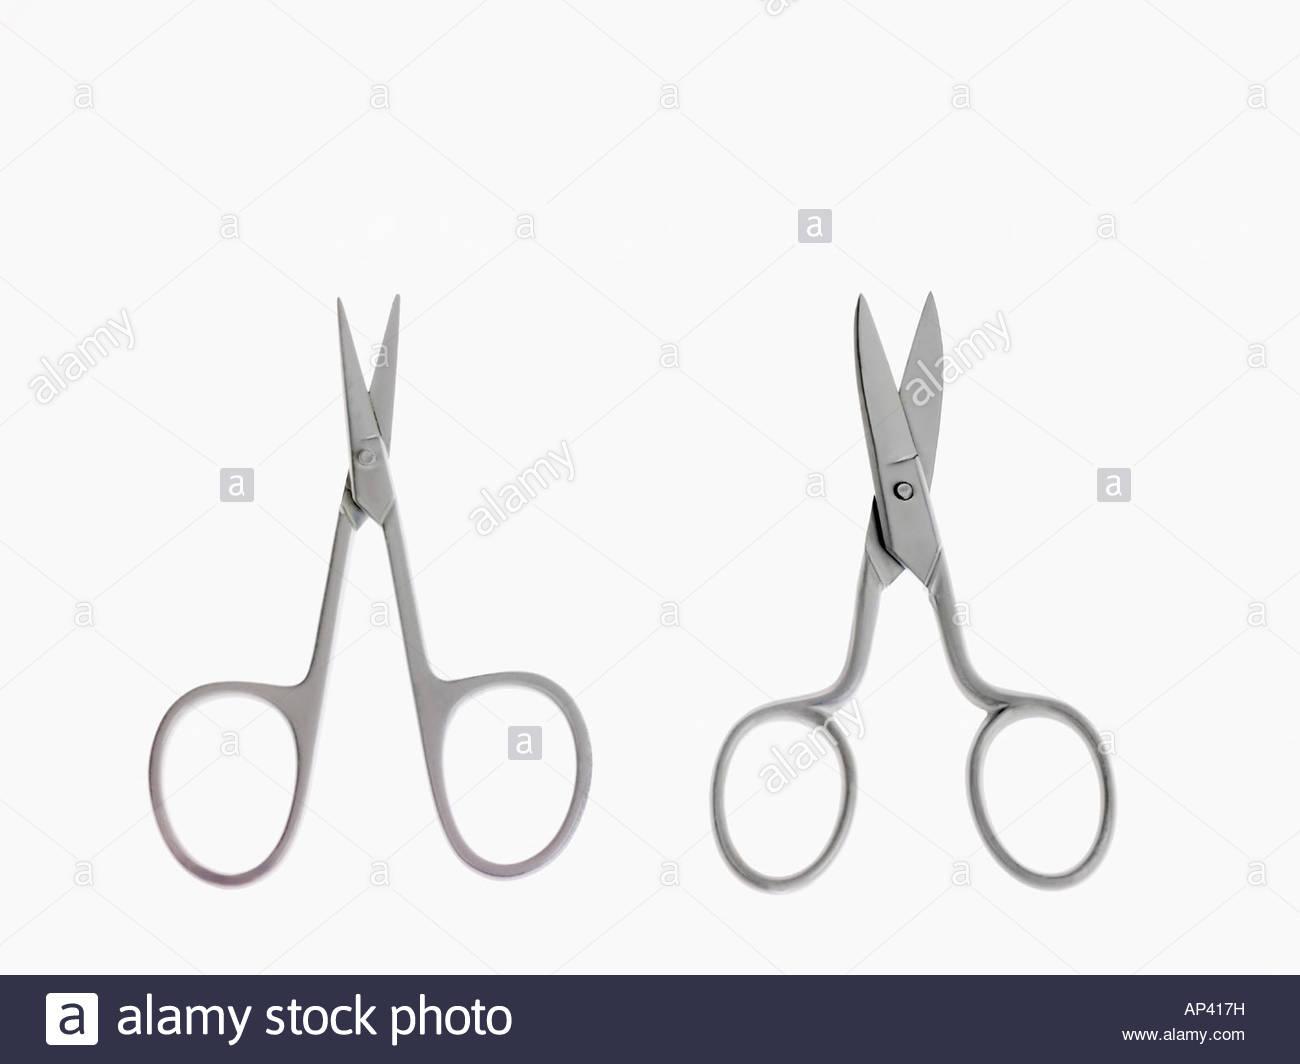 Two pairs of scissors - Stock Image